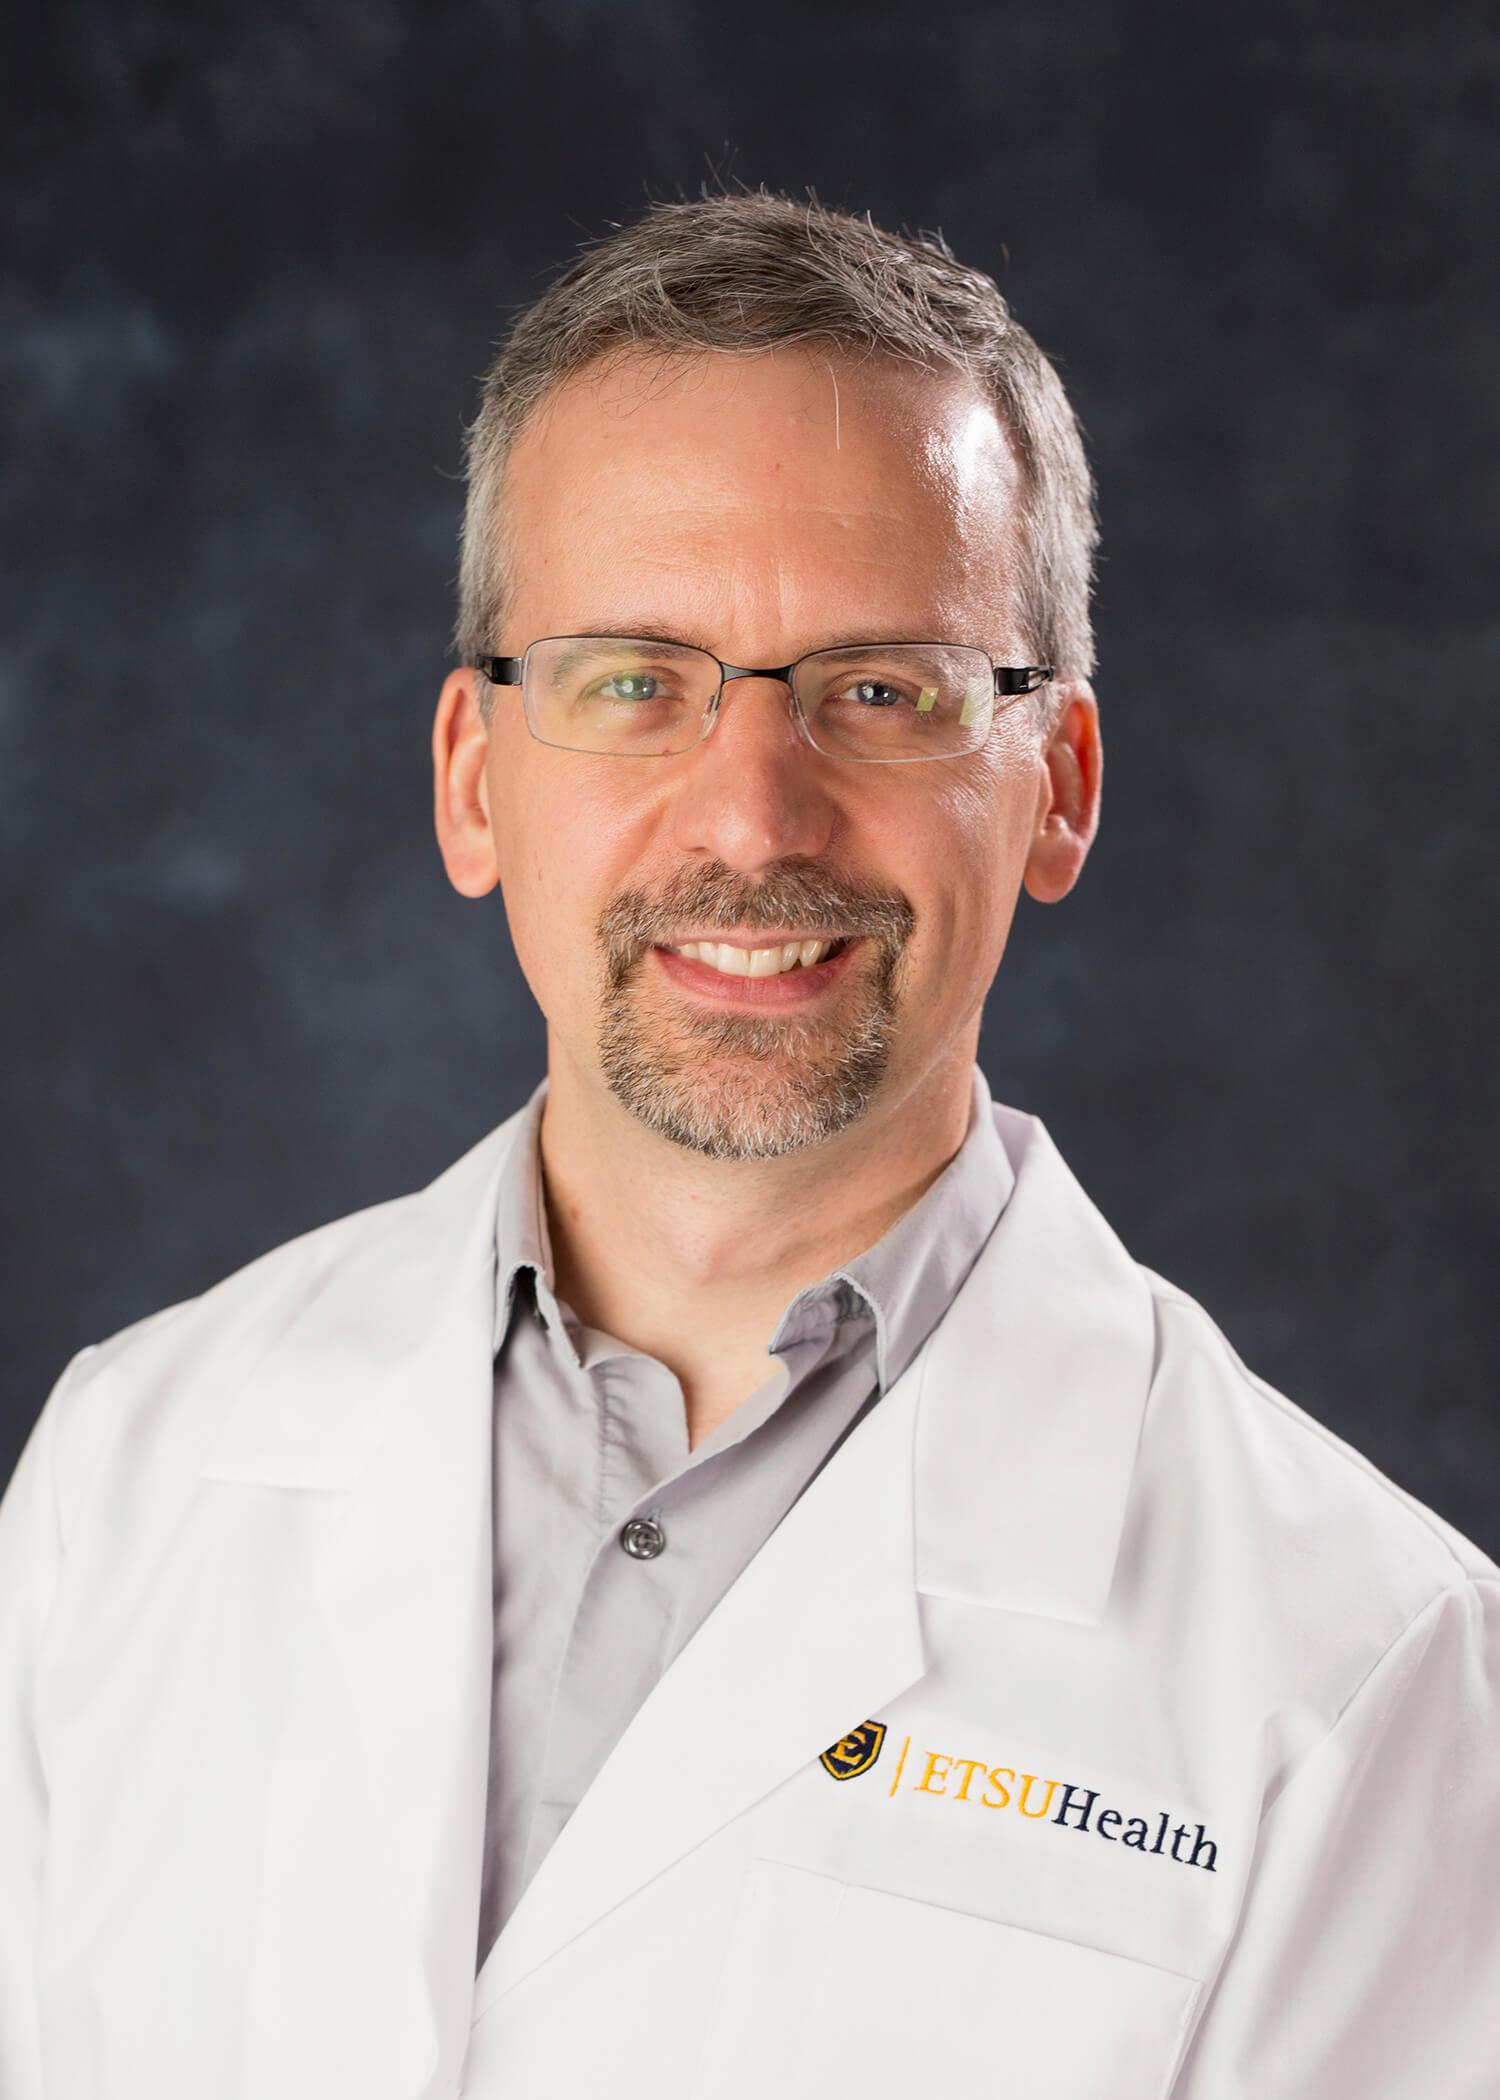 Photo of Mark Brummel, D.O.